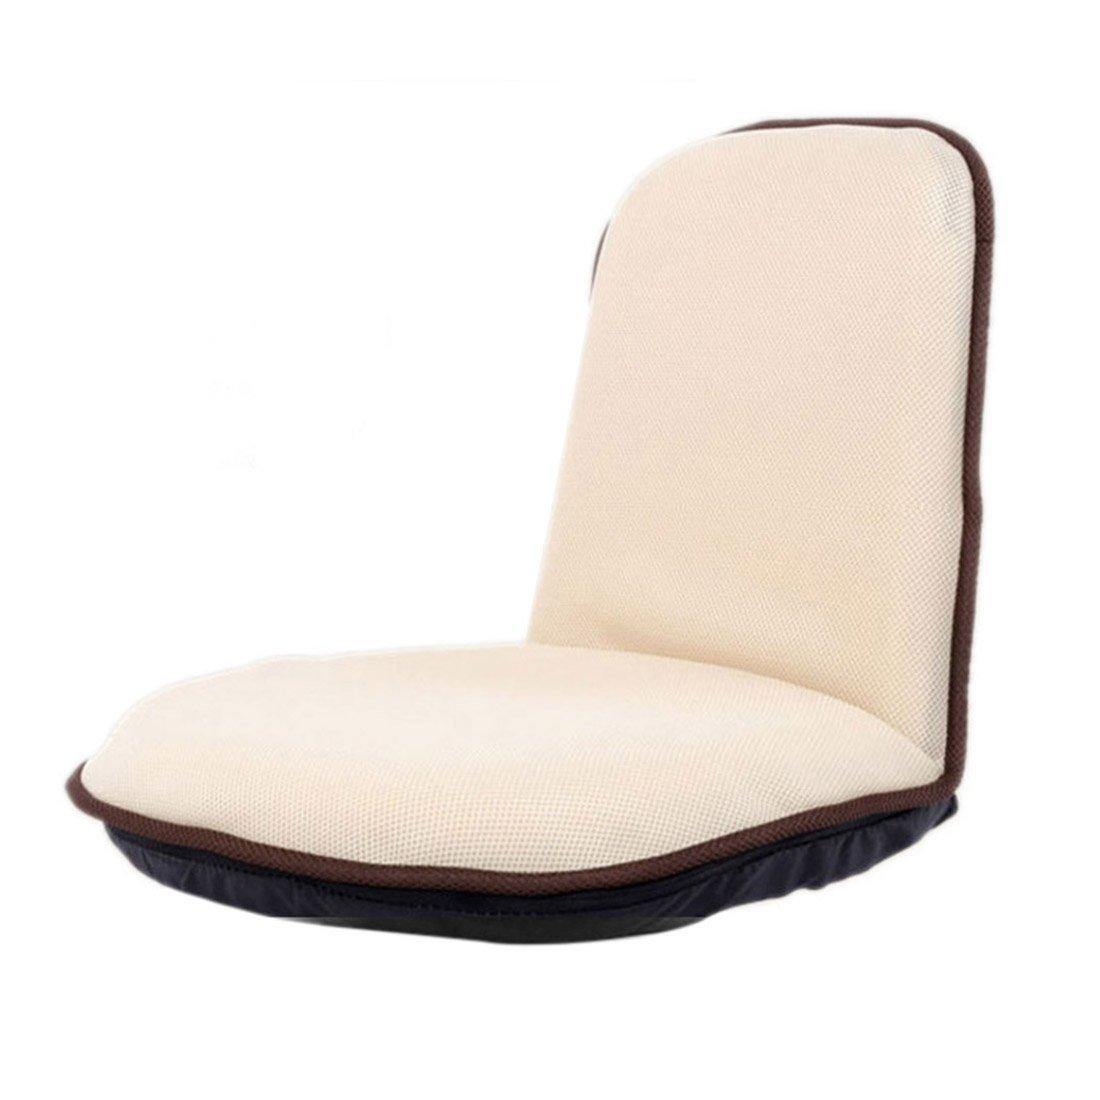 Jiyaru Adjustable Floor Chair 5-Position Folding Gaming Cushion Padded Lazy Sofa Beige